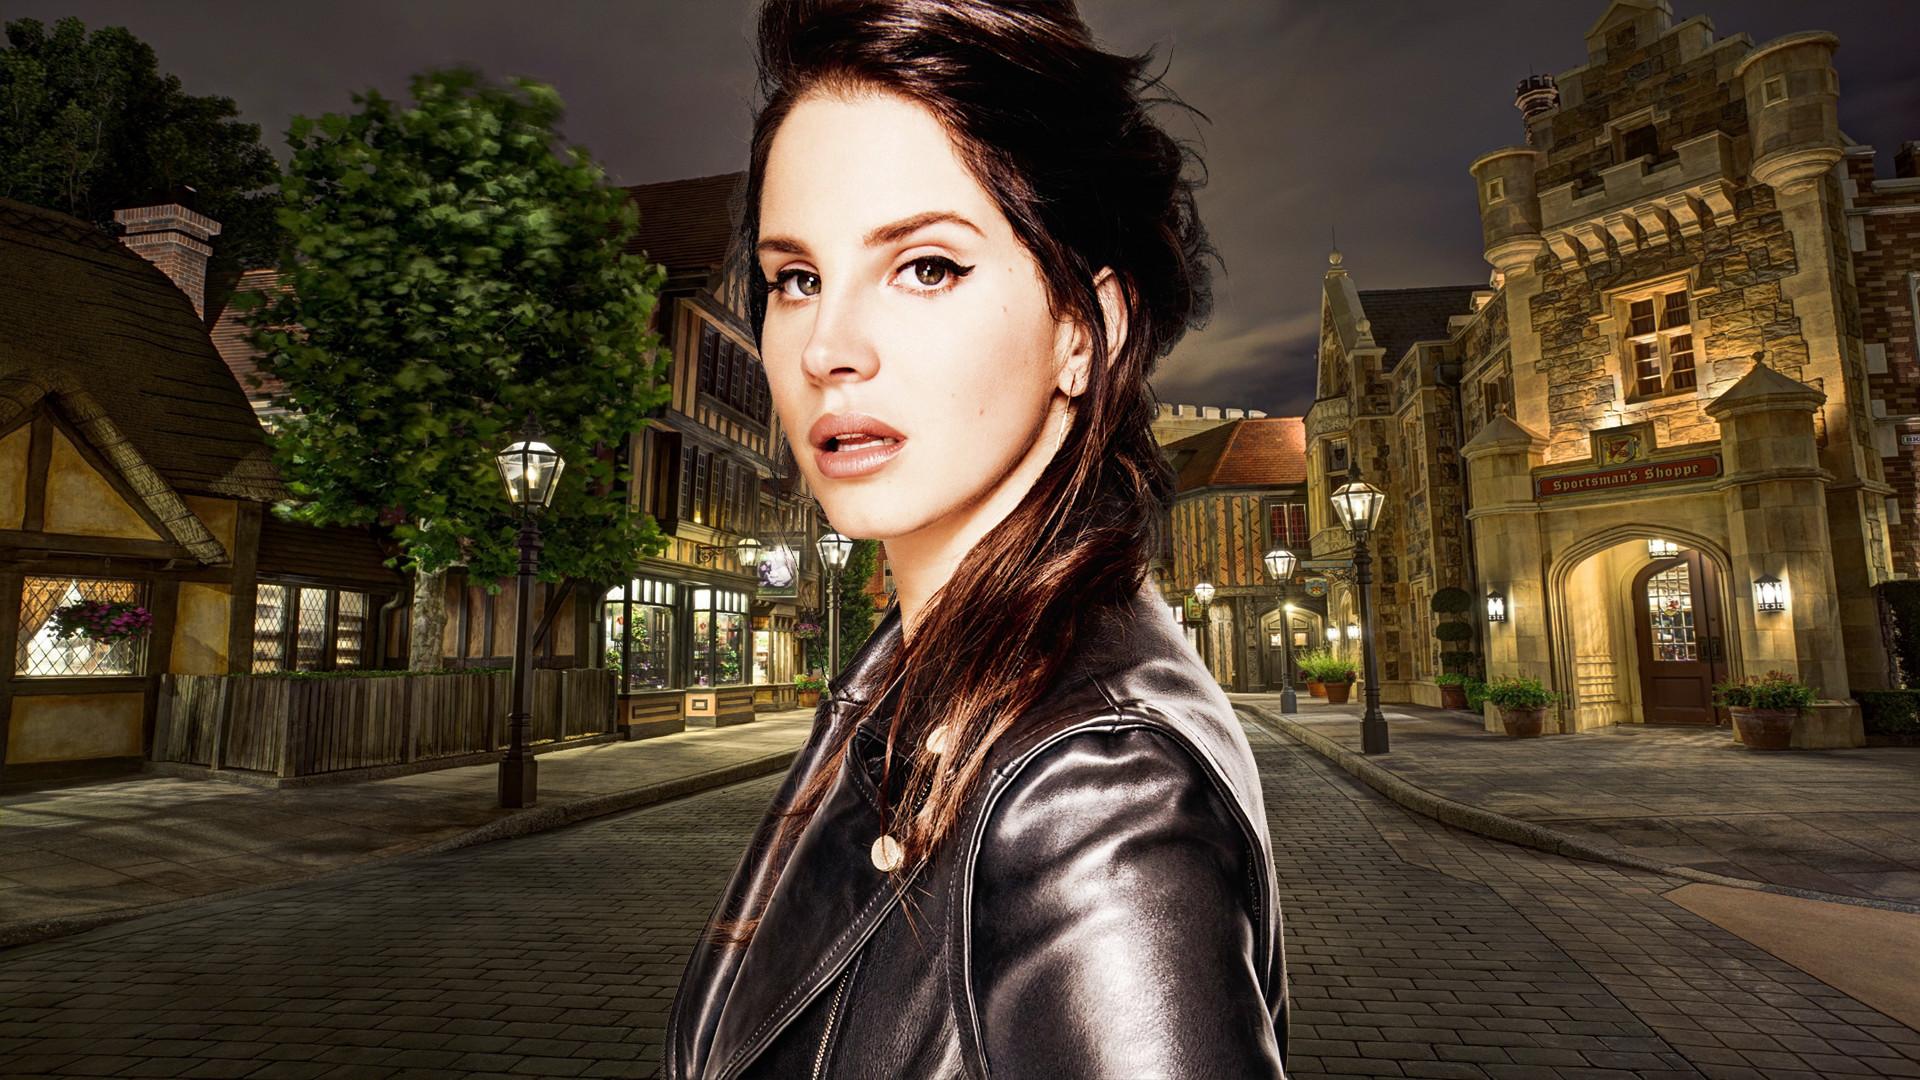 Lana Del Rey Wallpapers (76+ pictures)